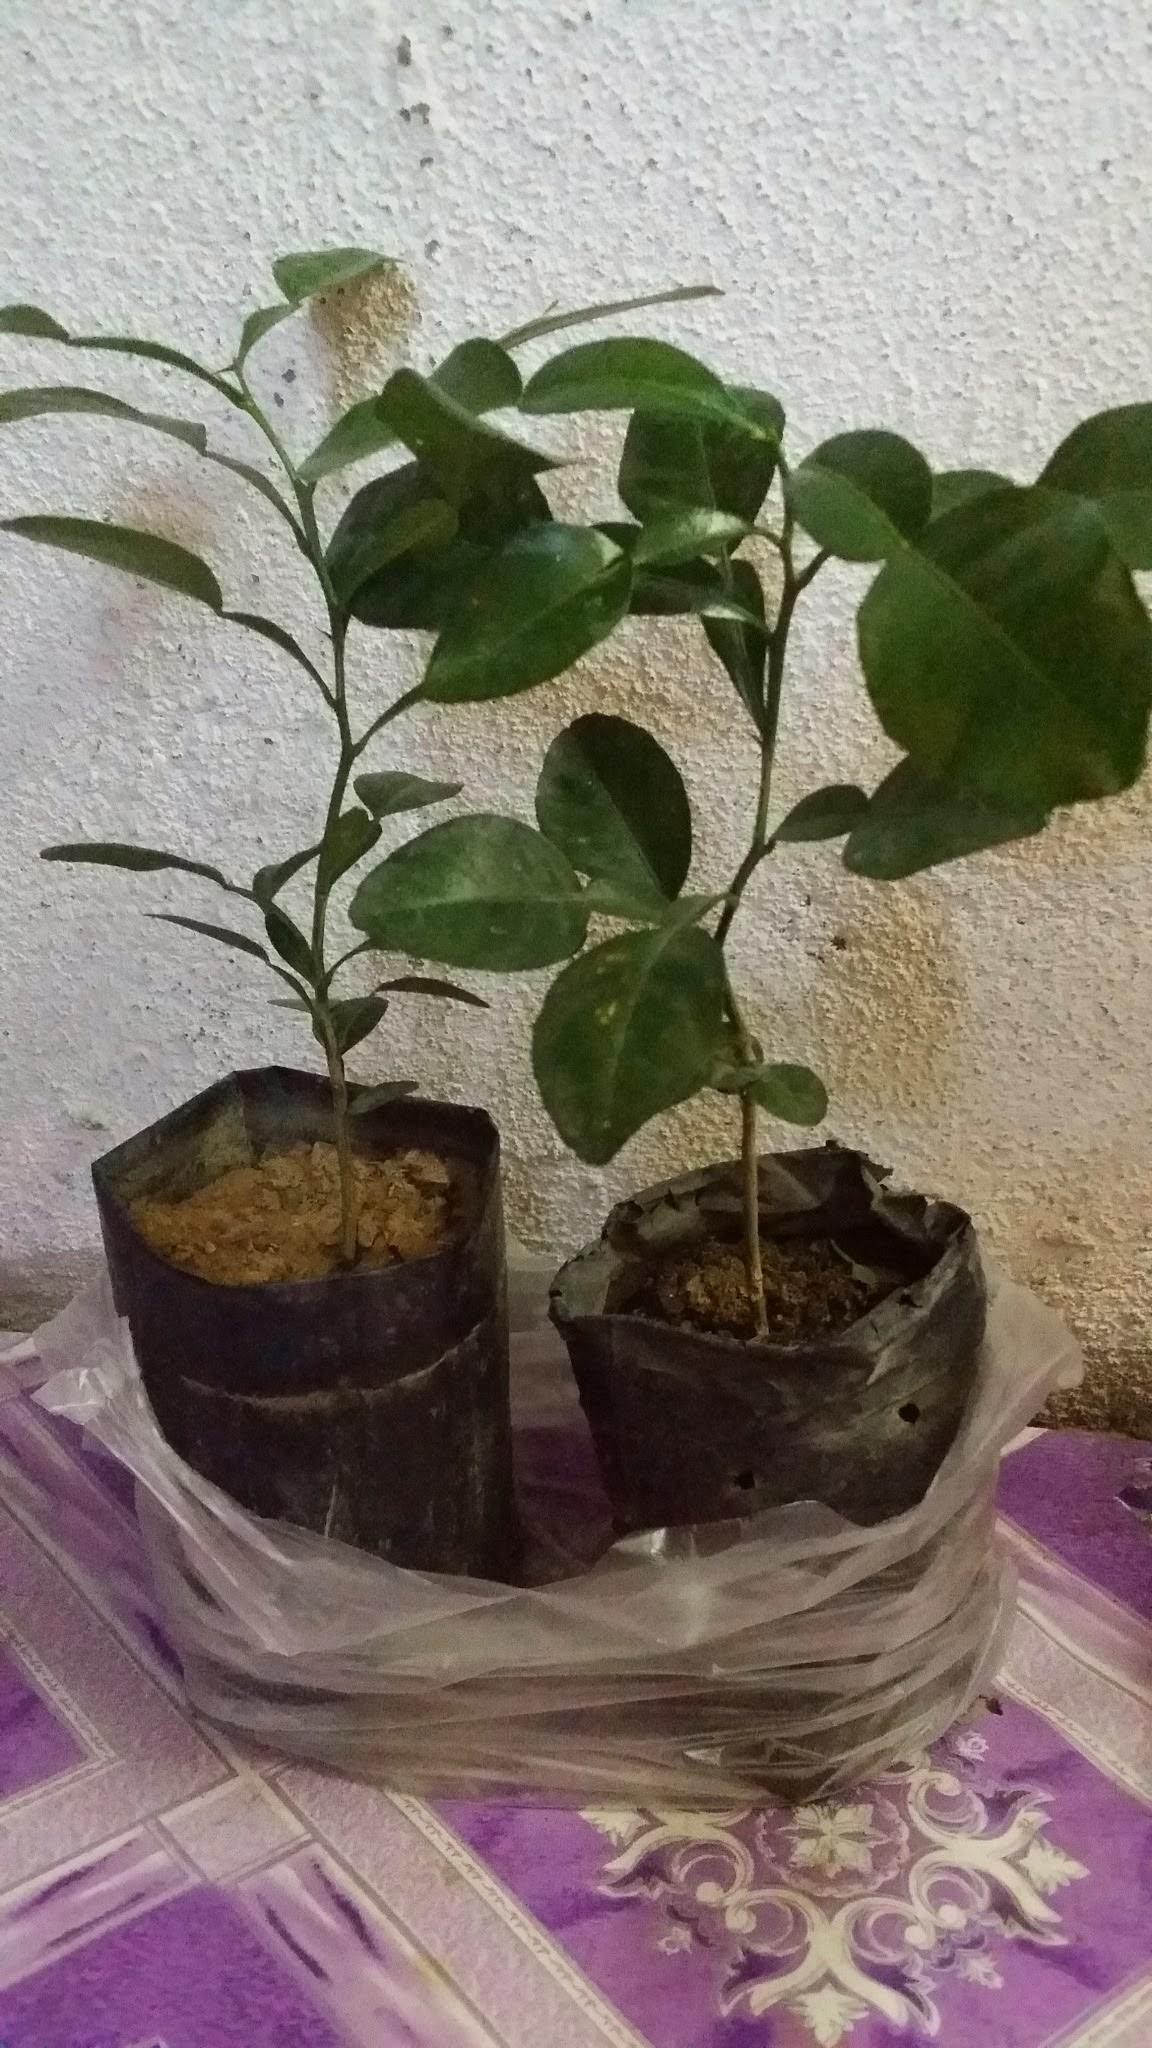 anak pokok daun limau purut, beli pokok limau, benih poko limau purut, daun limau purut, harga pokok limau